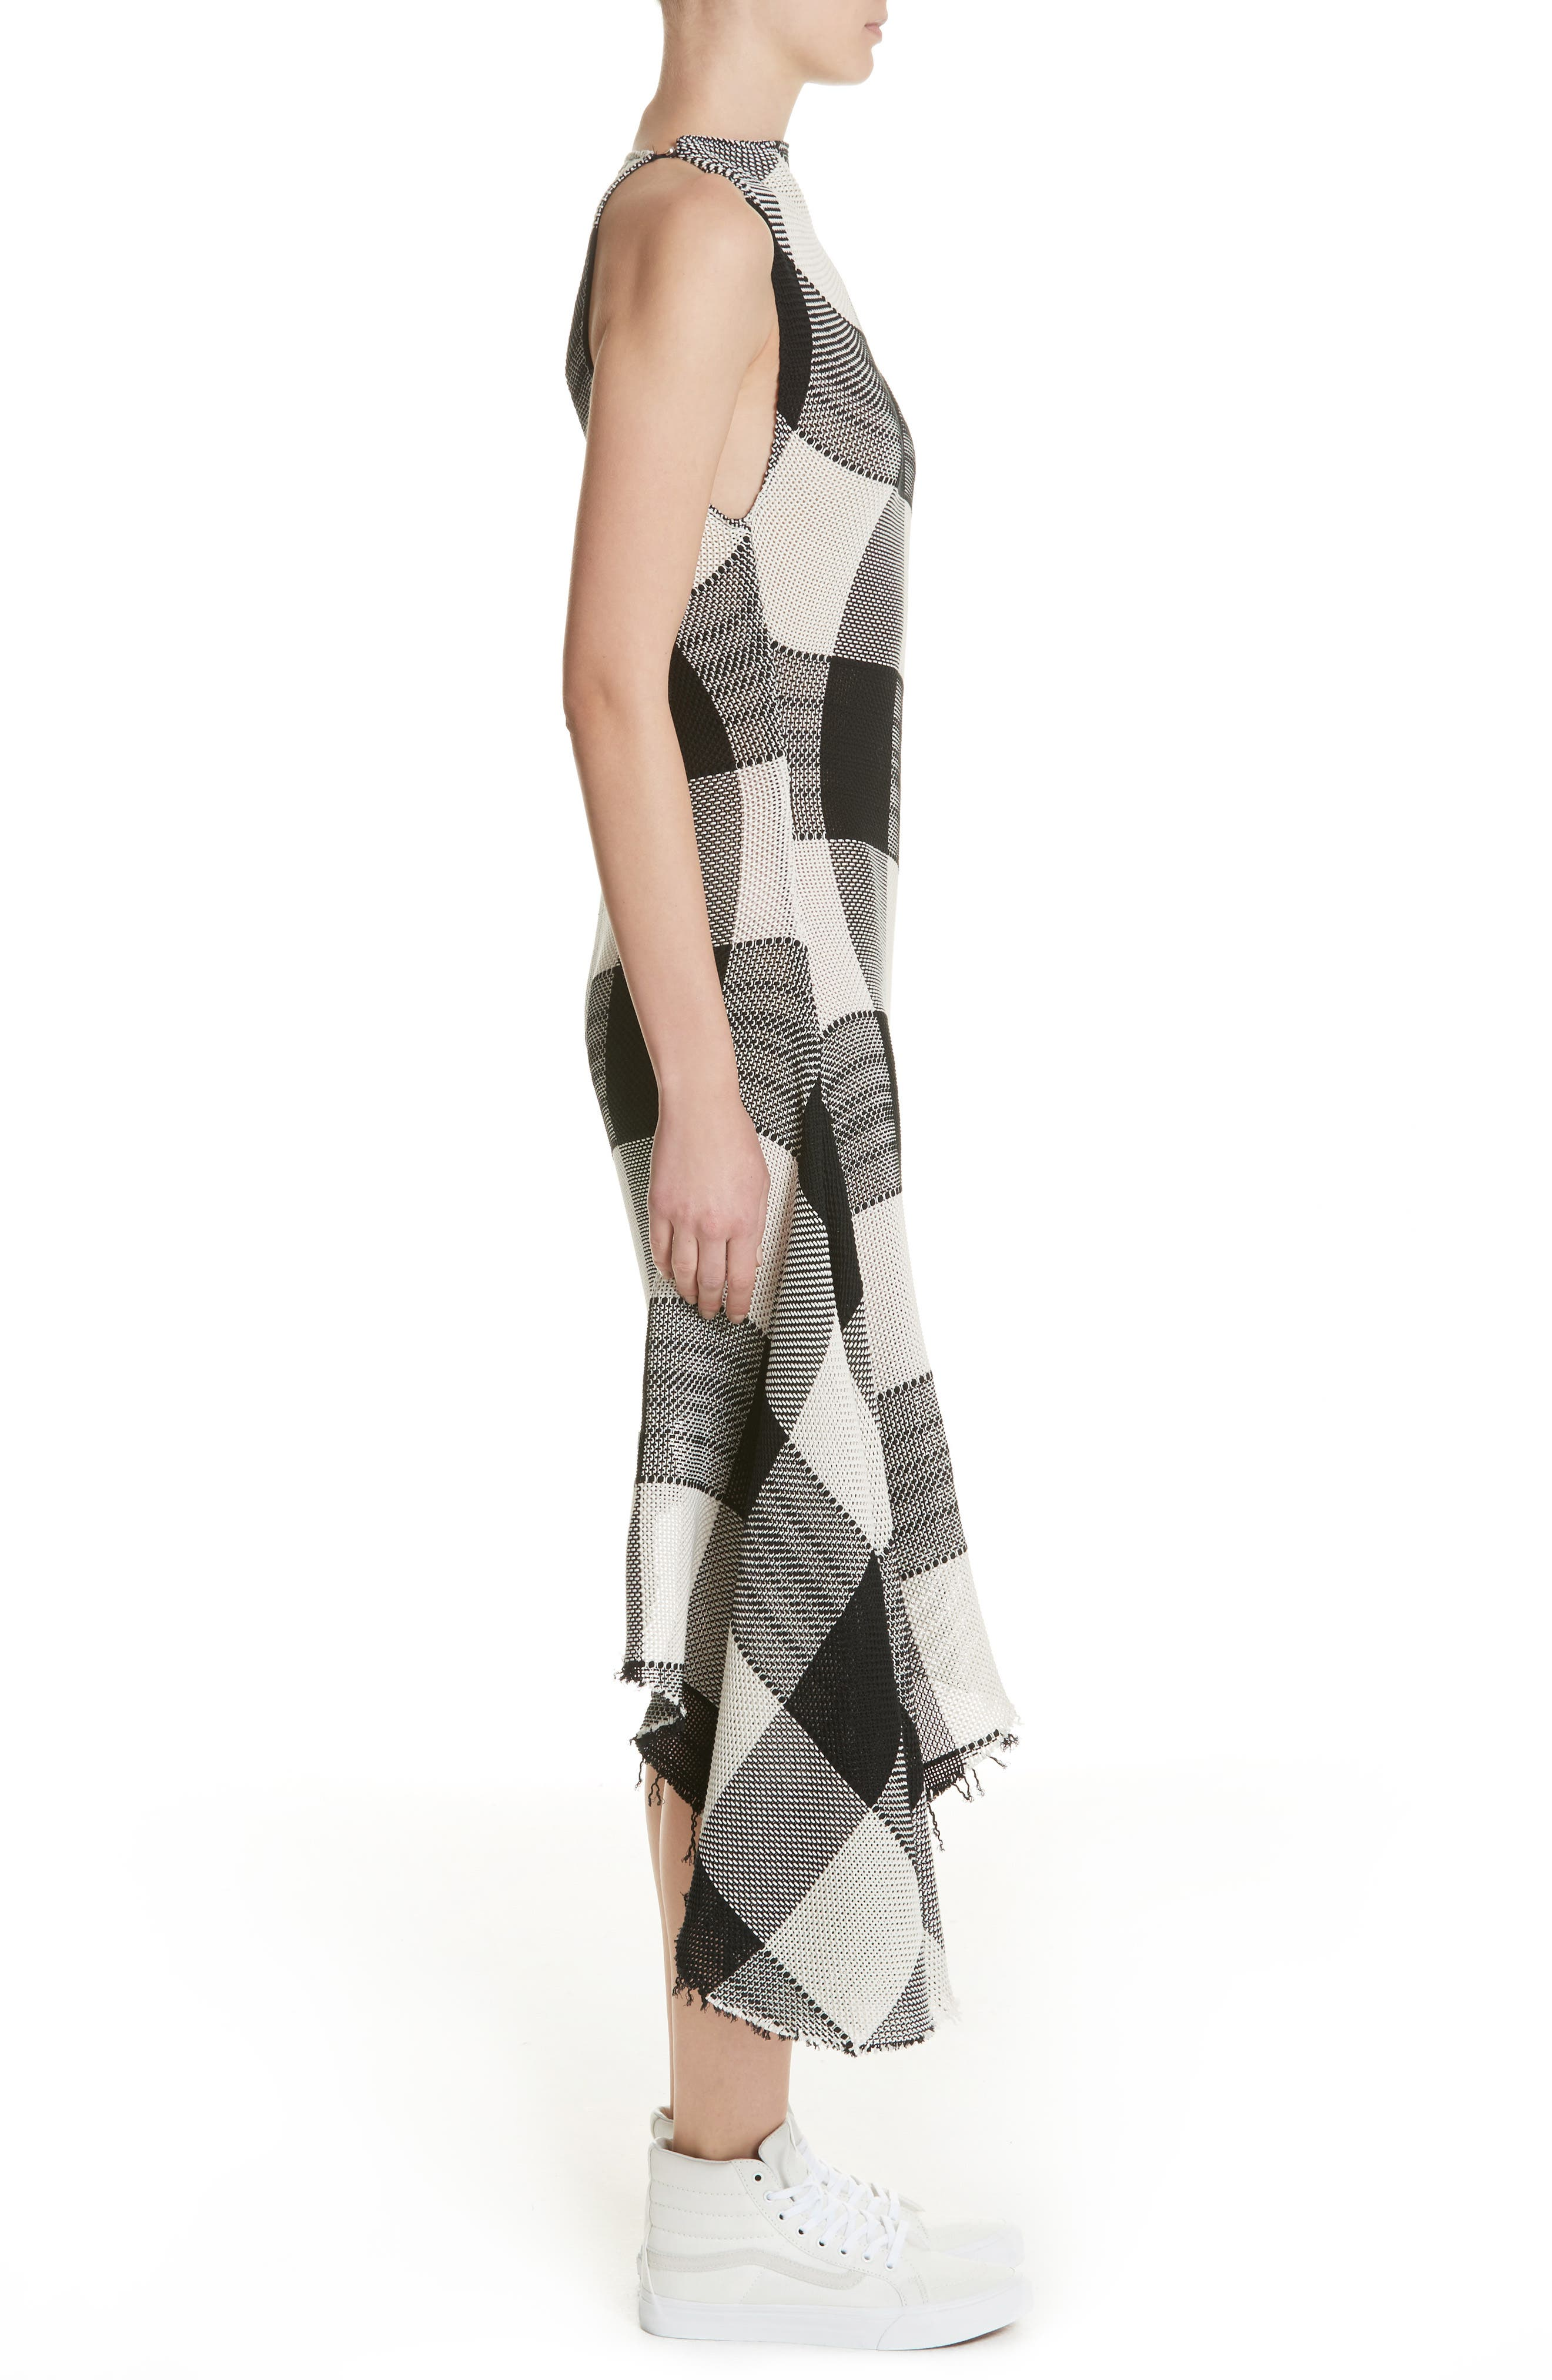 Marques'Almeida Asymmetrical Gingham Sheath Dress,                             Alternate thumbnail 3, color,                             Black/White